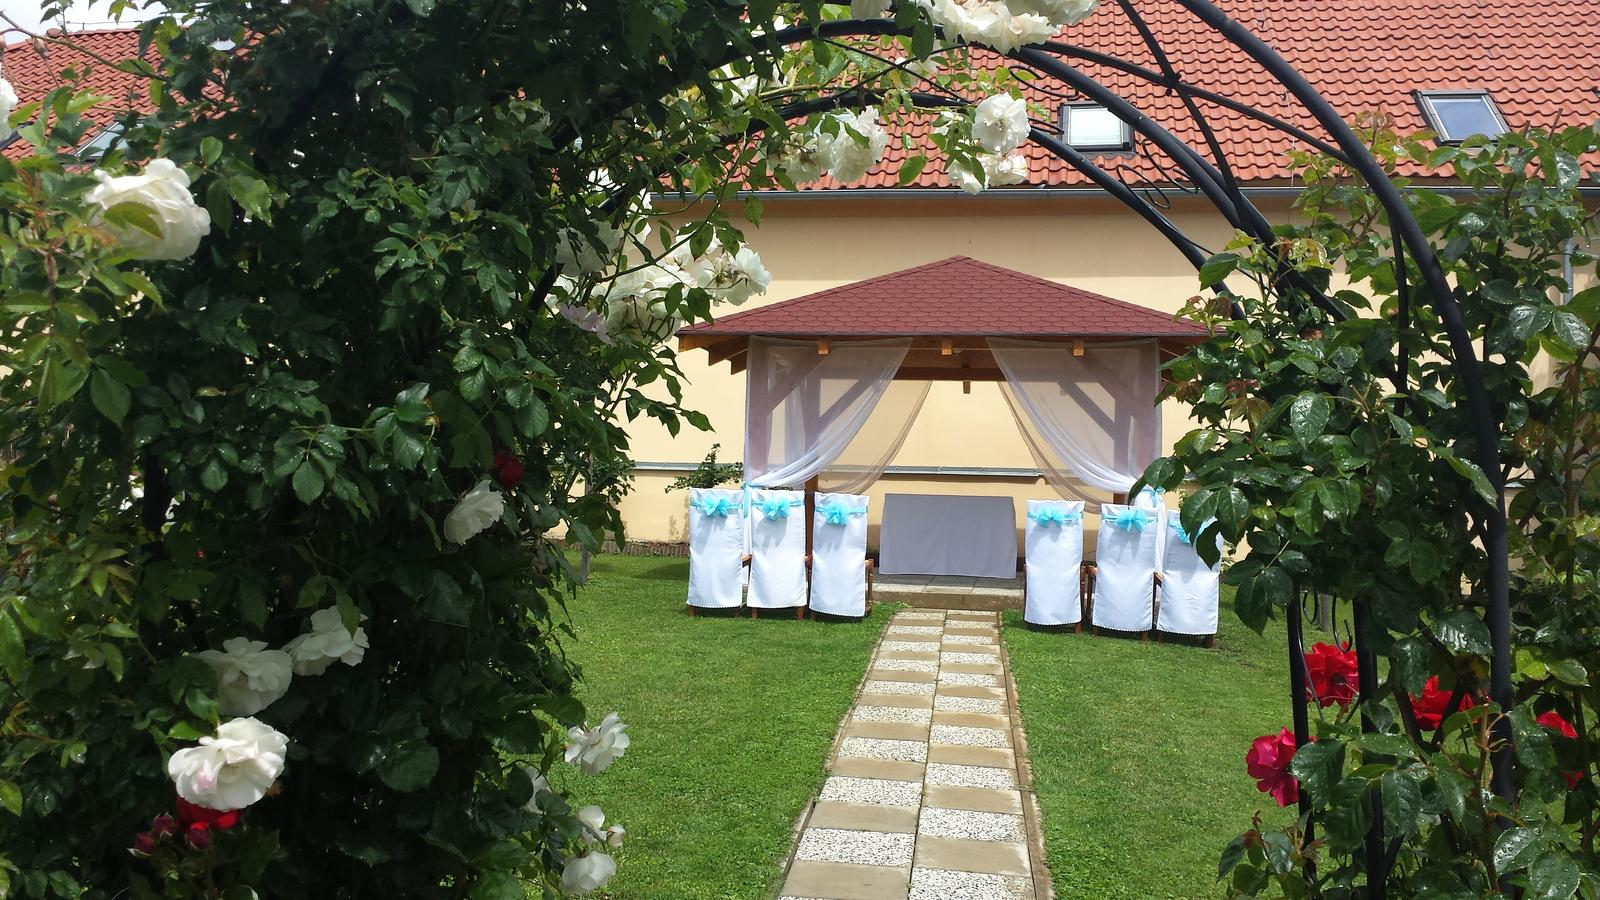 kvetaszenkova - Svatební altánek na zahradě